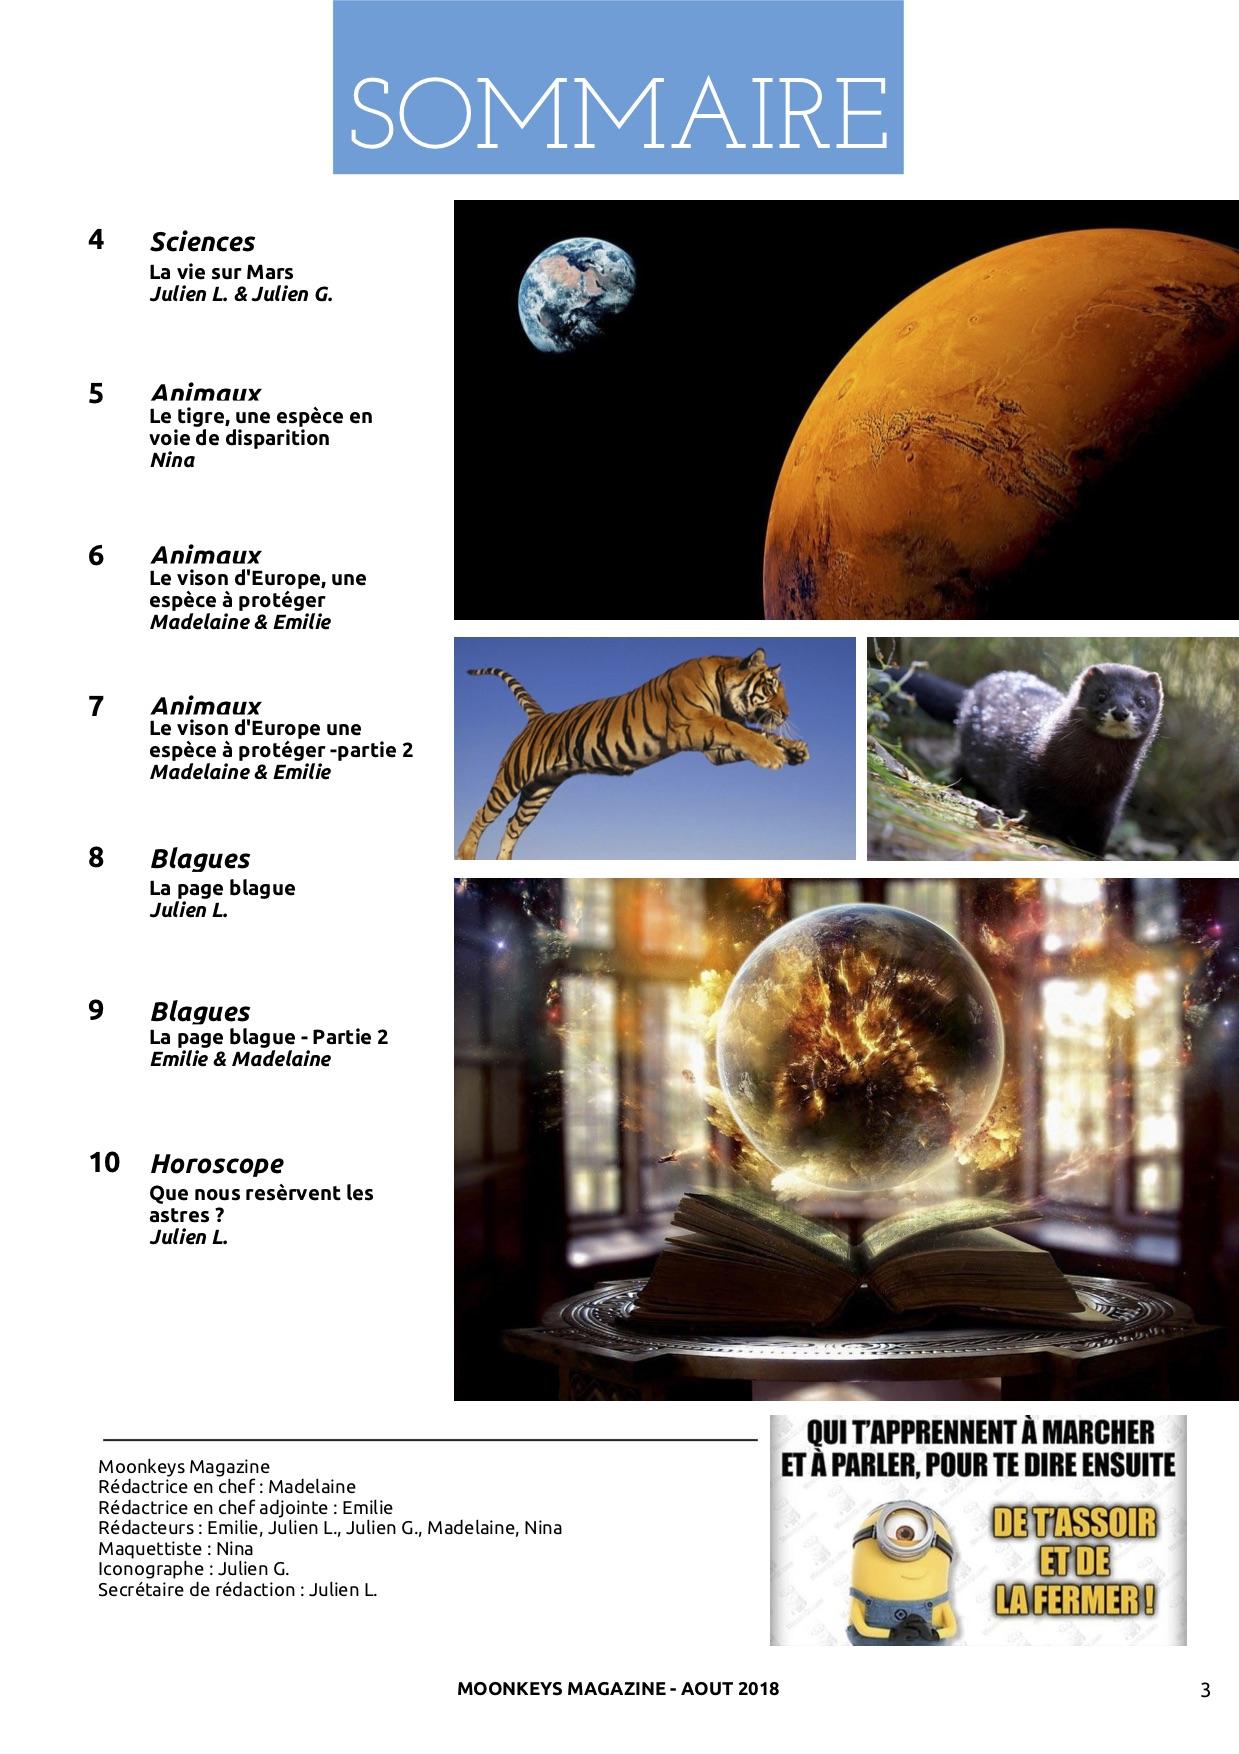 MoonKeys mag aout - 3.jpg